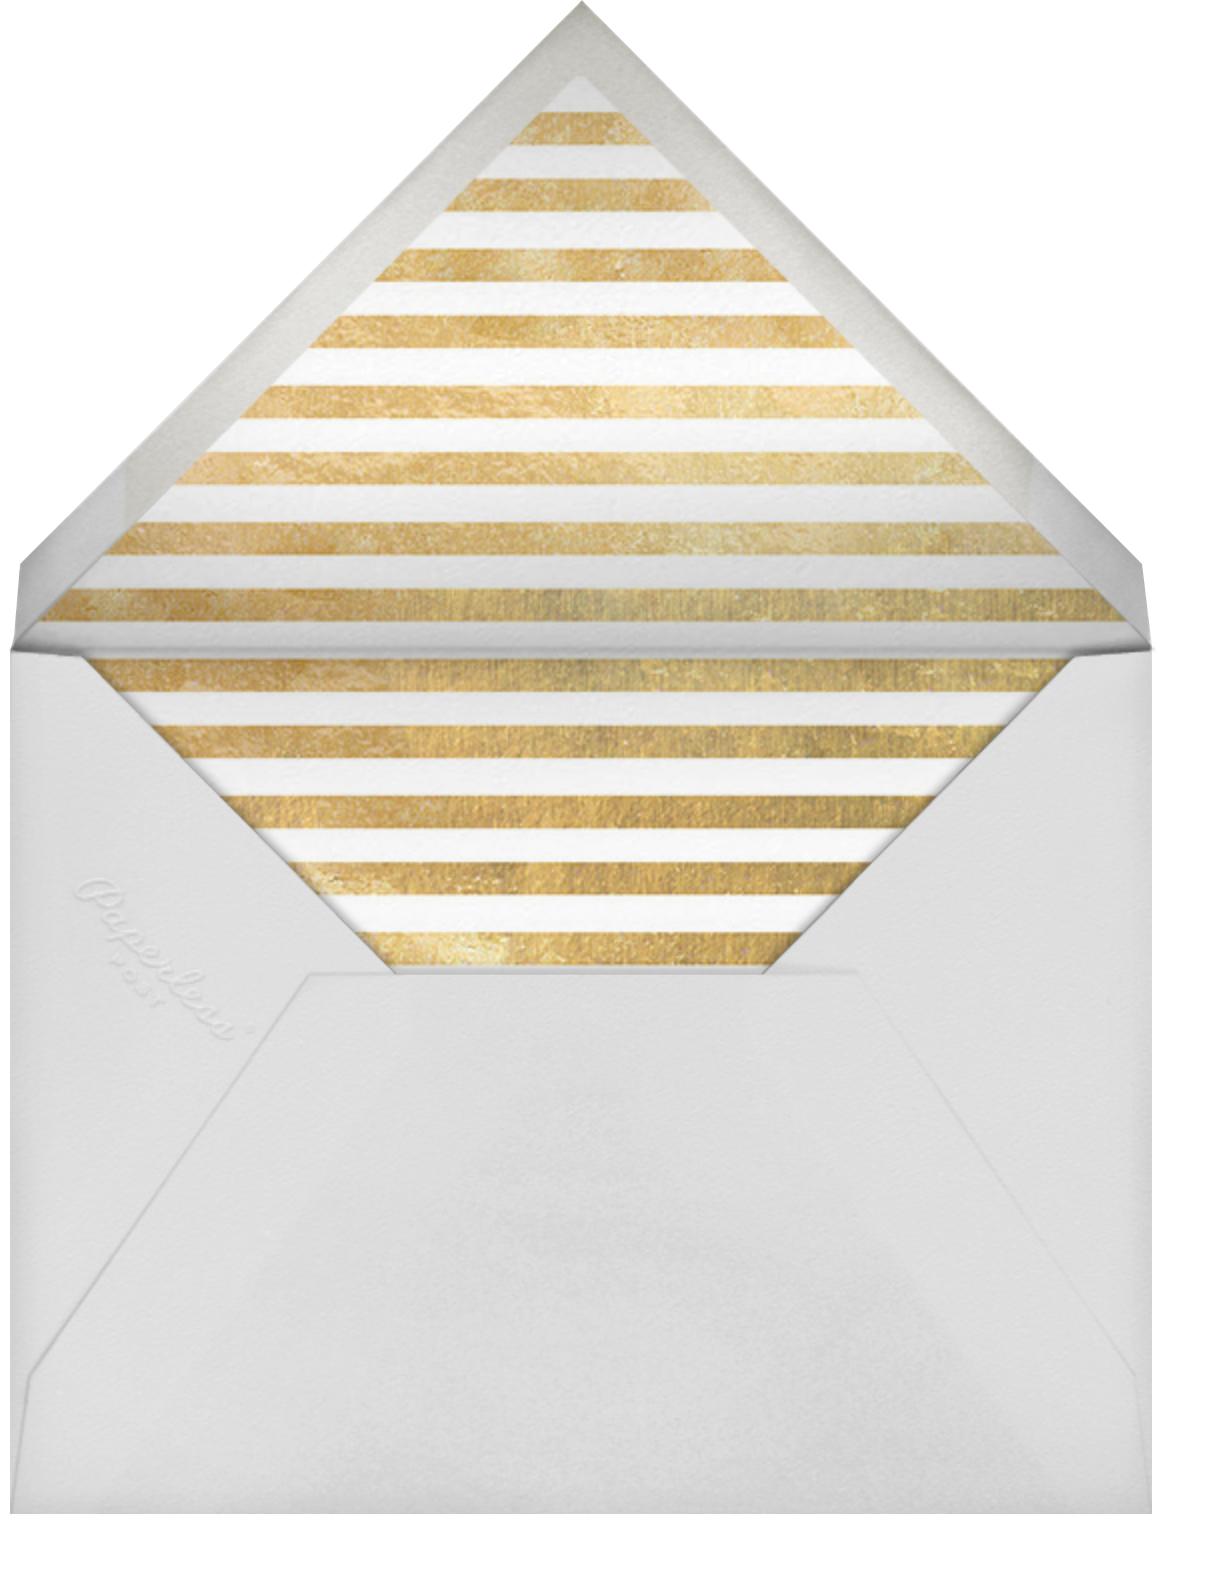 Champagne Bubbles - Paperless Post - Winter entertaining - envelope back